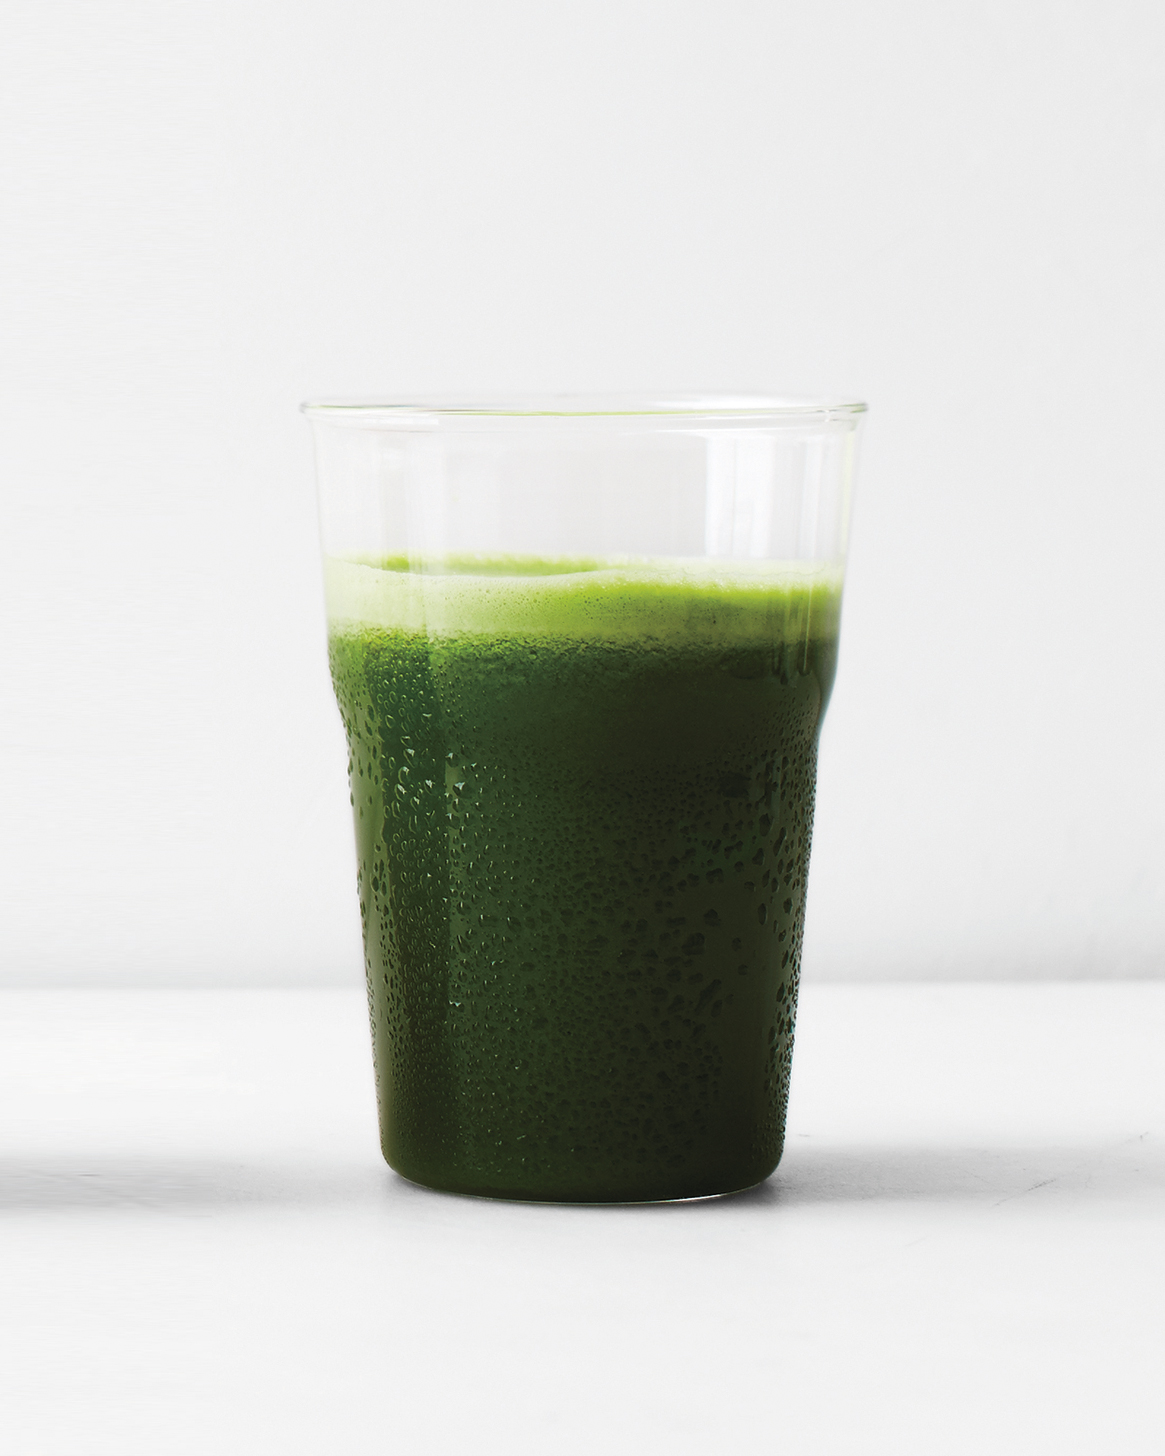 clean-slate-juice-ultra-green-juice-0115.jpg